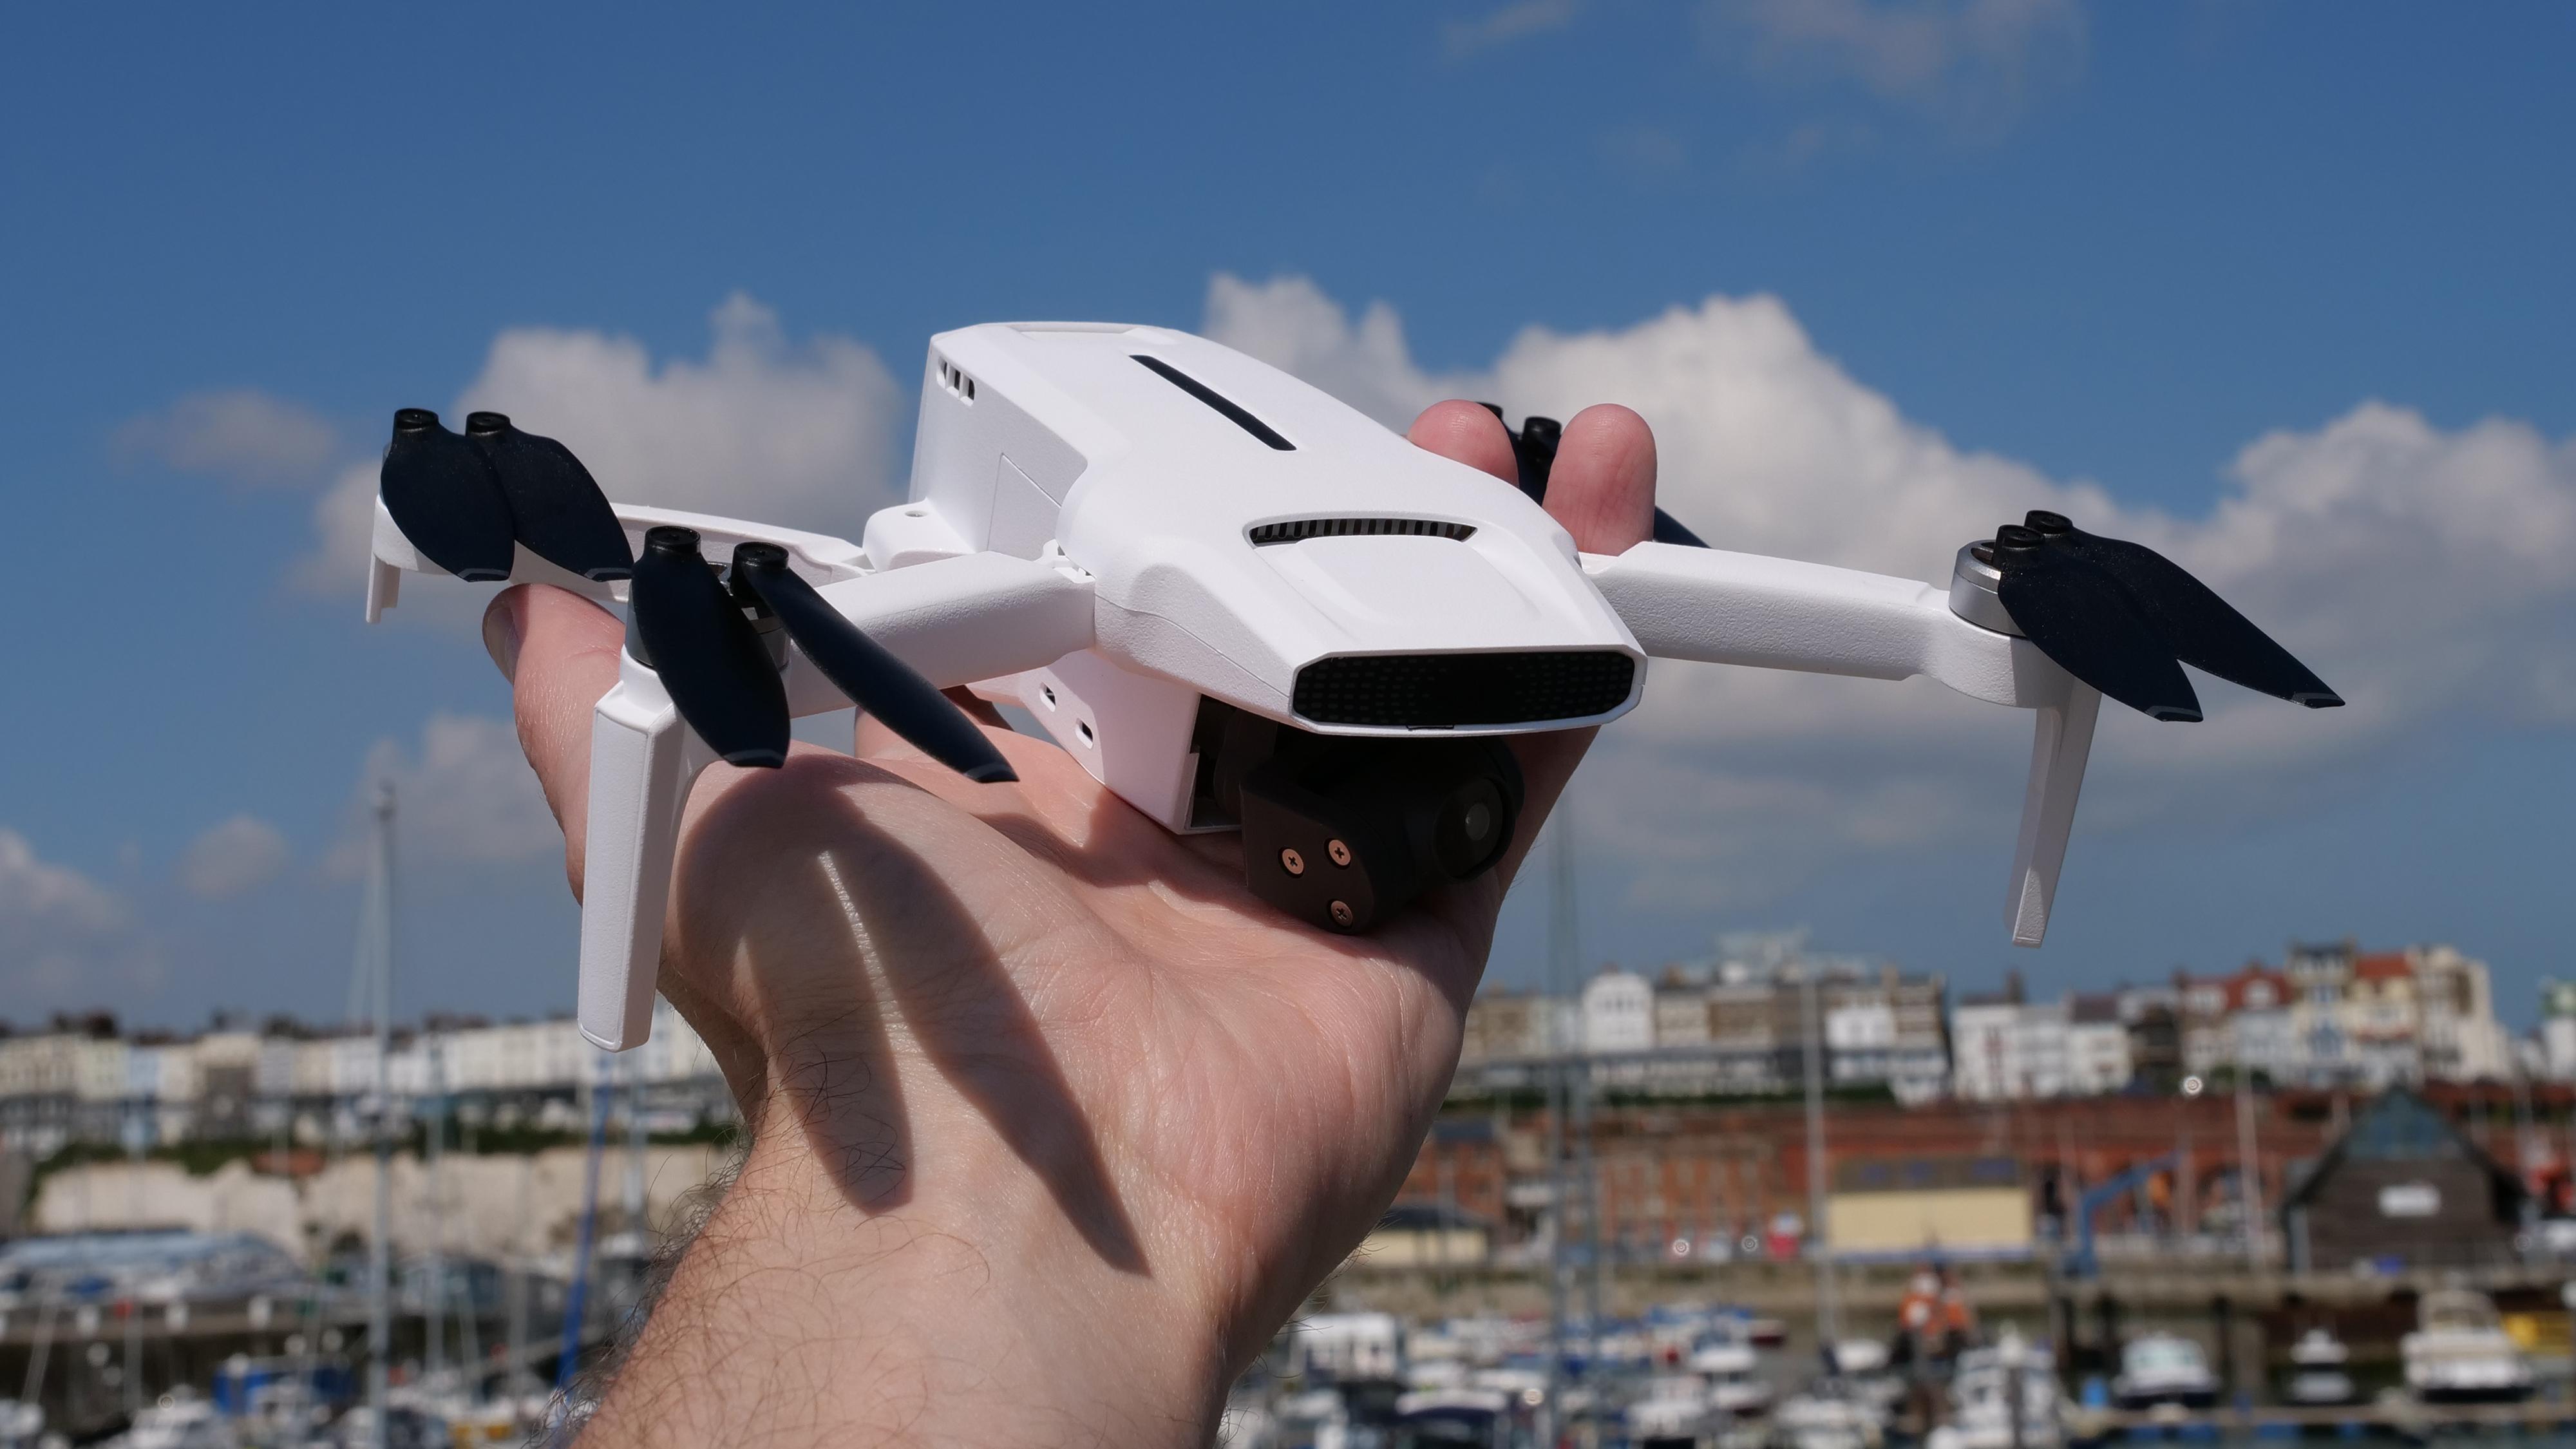 A hand holding the FIMI X8 Mini drone